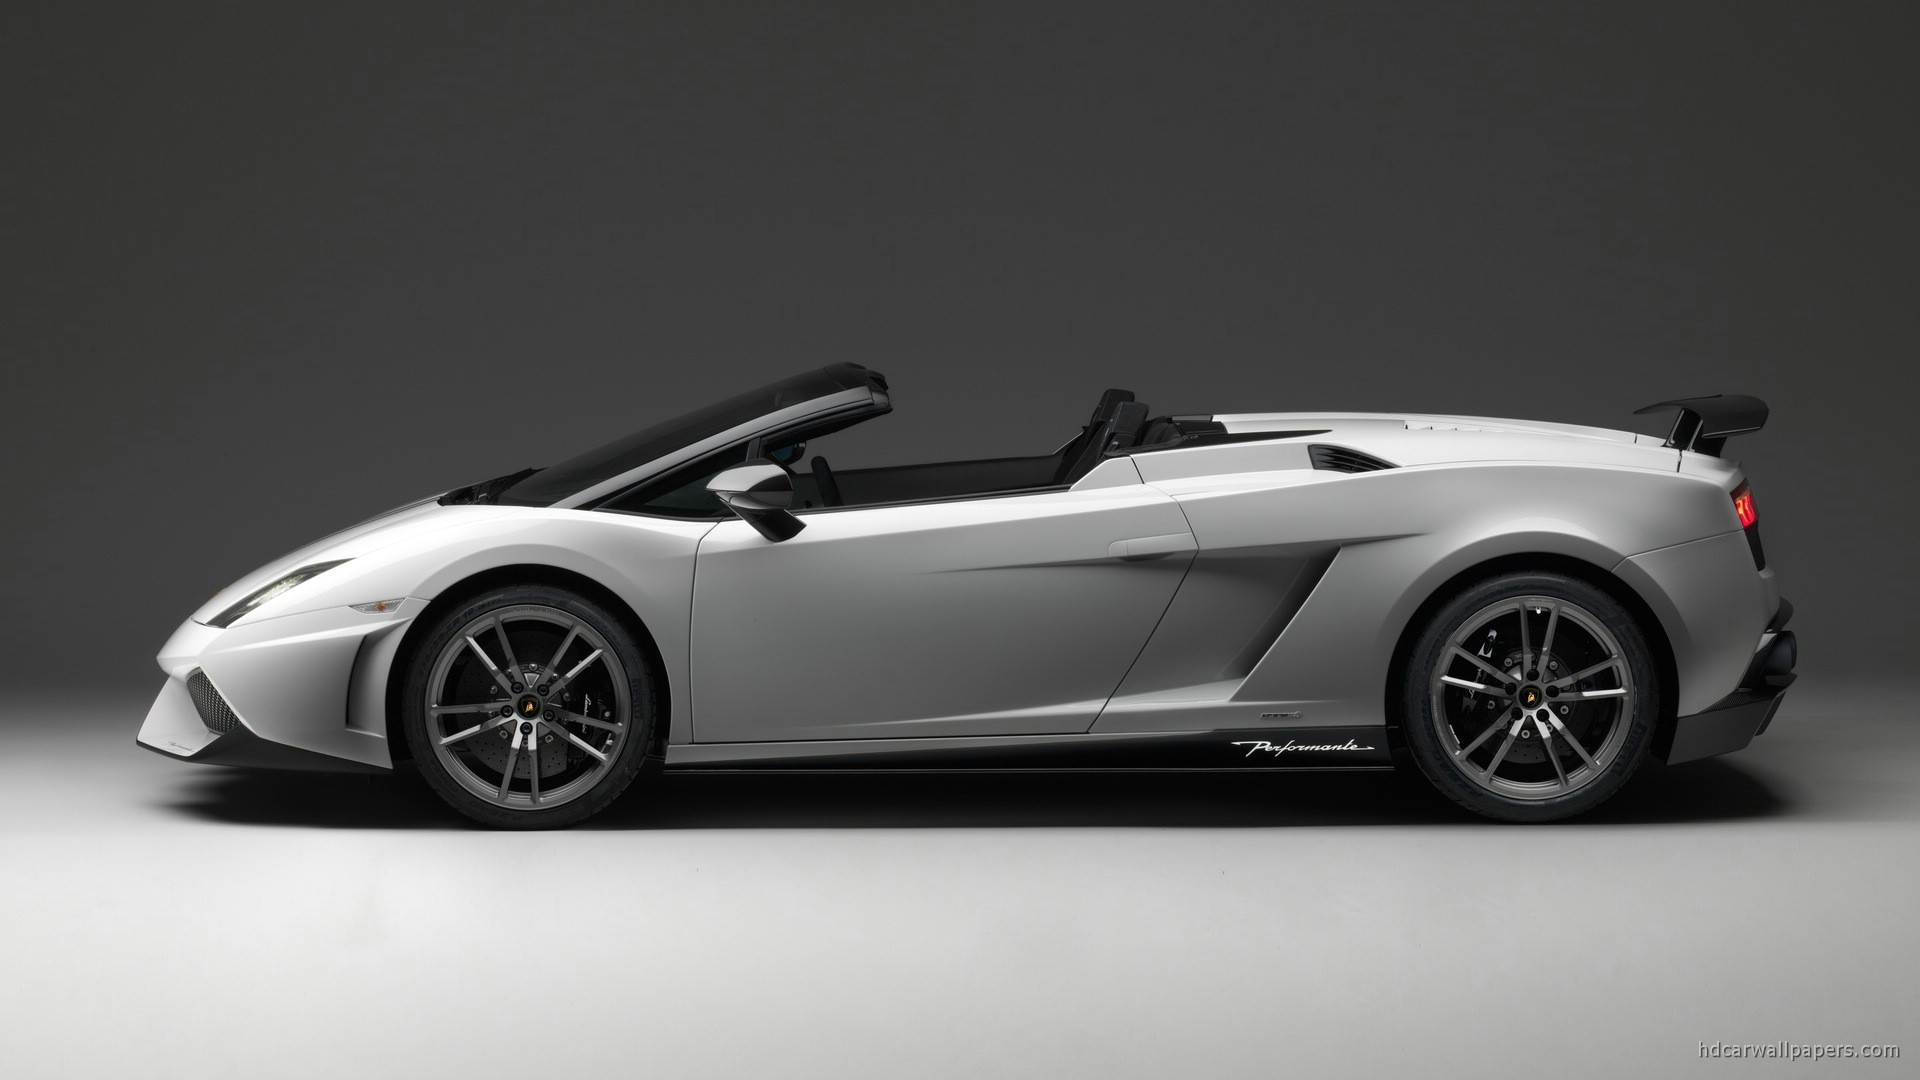 Lamborghini Gallardo Lp 570 4 Spyder Performante Wallpaper